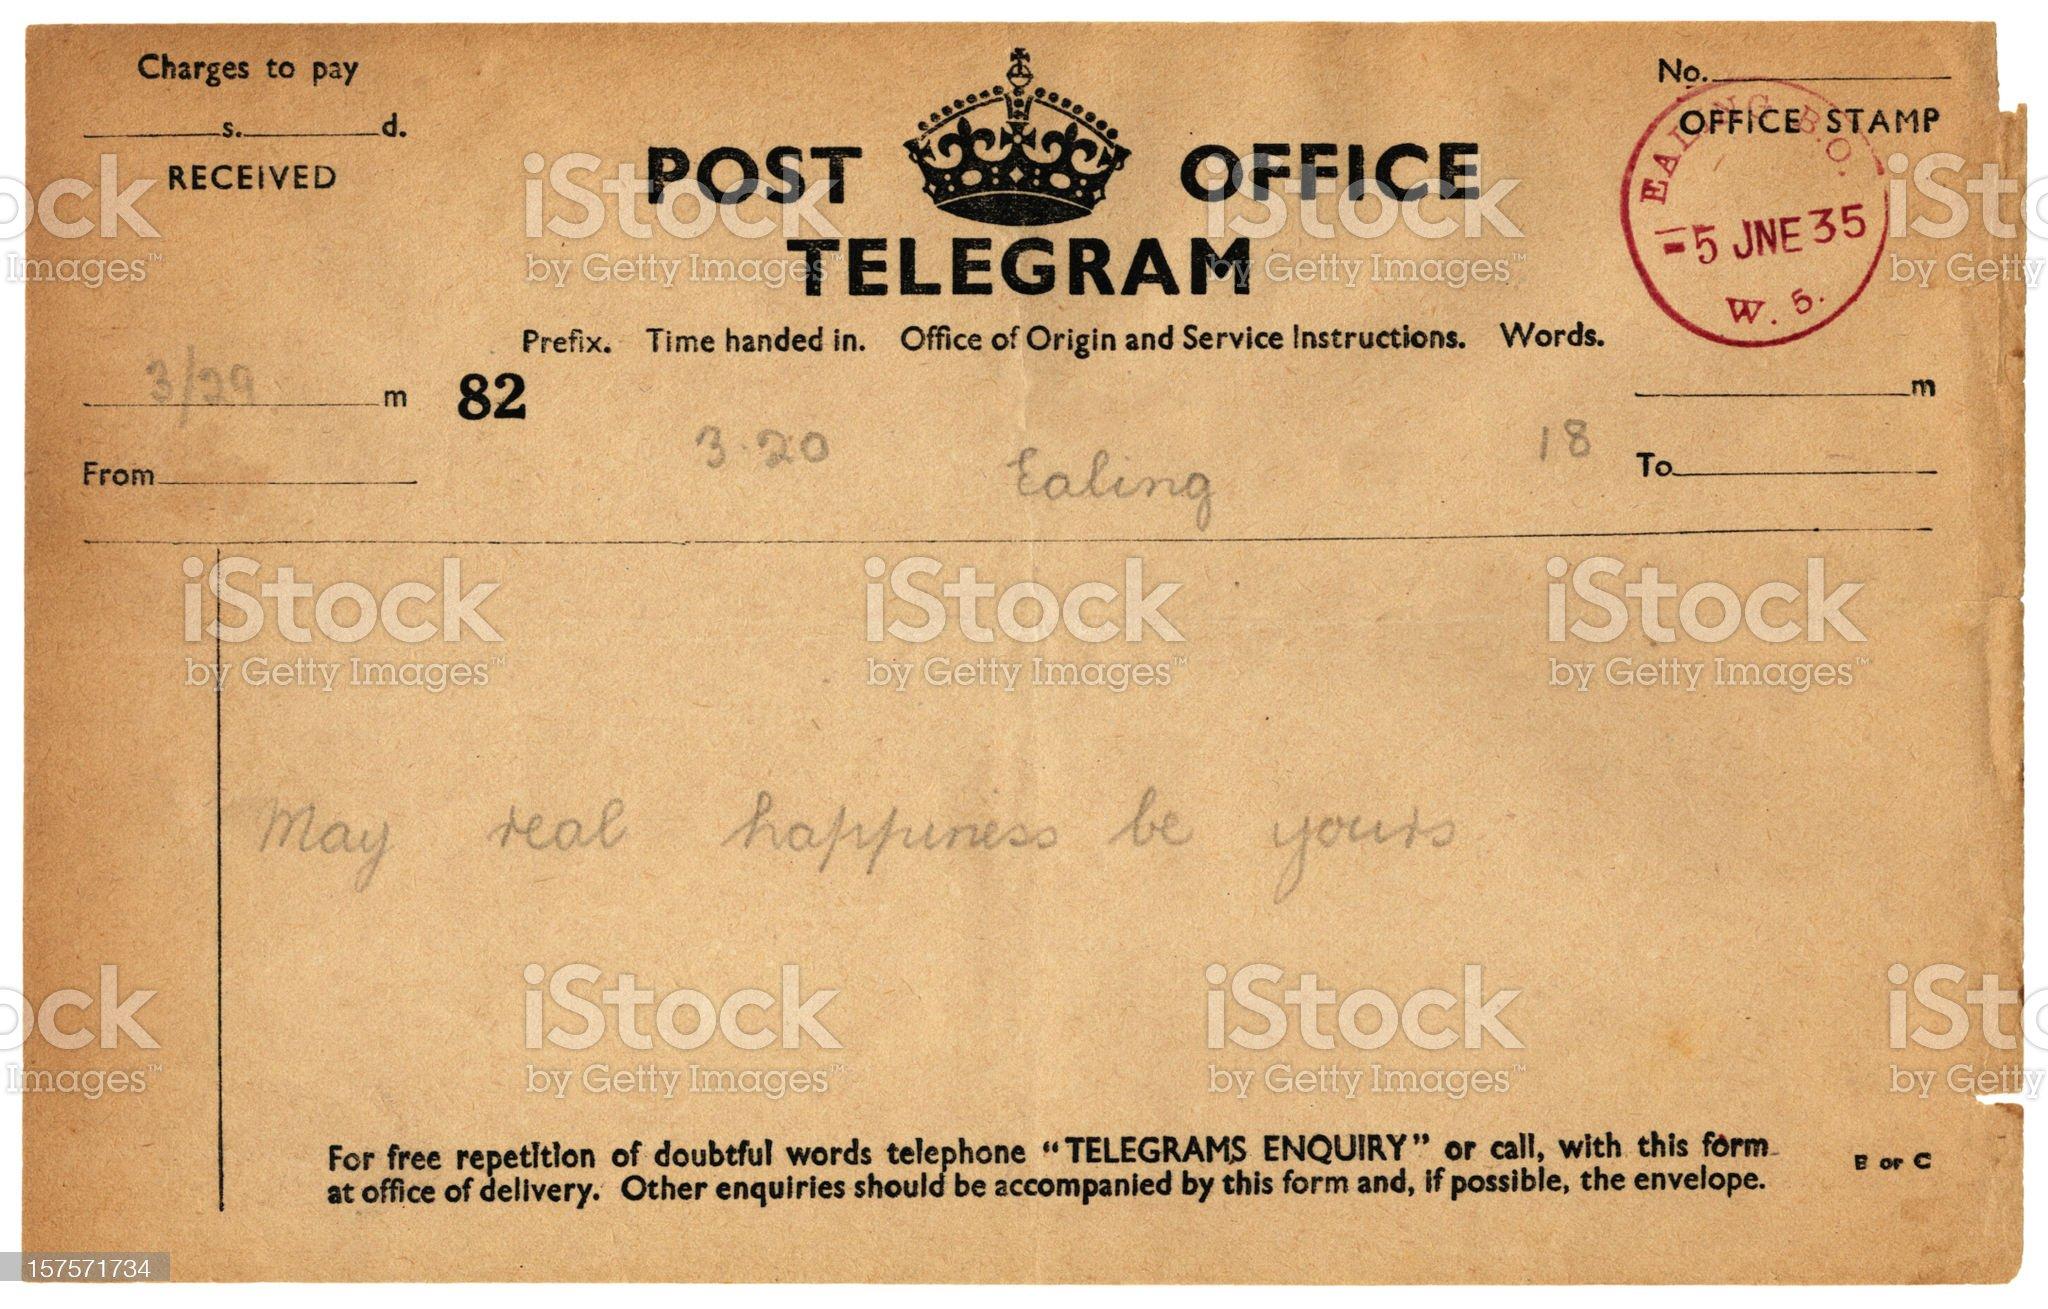 Wedding good wishes telegram, 1935 royalty-free stock photo